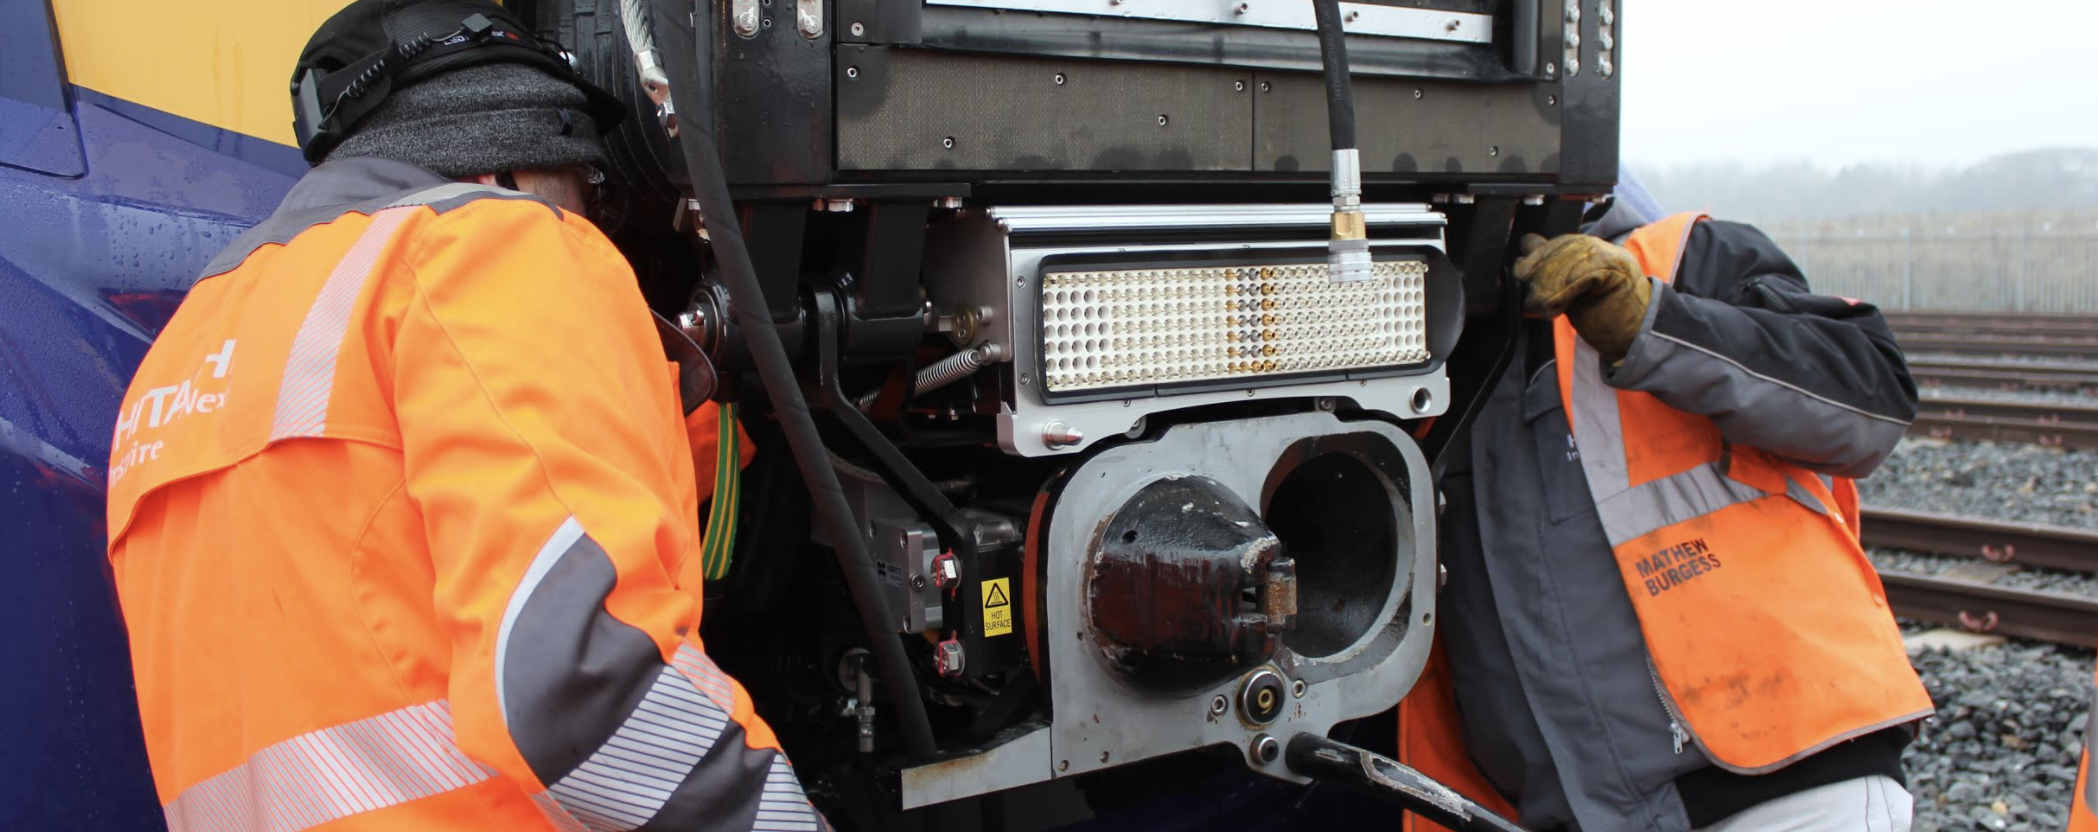 Innovative modification of a train